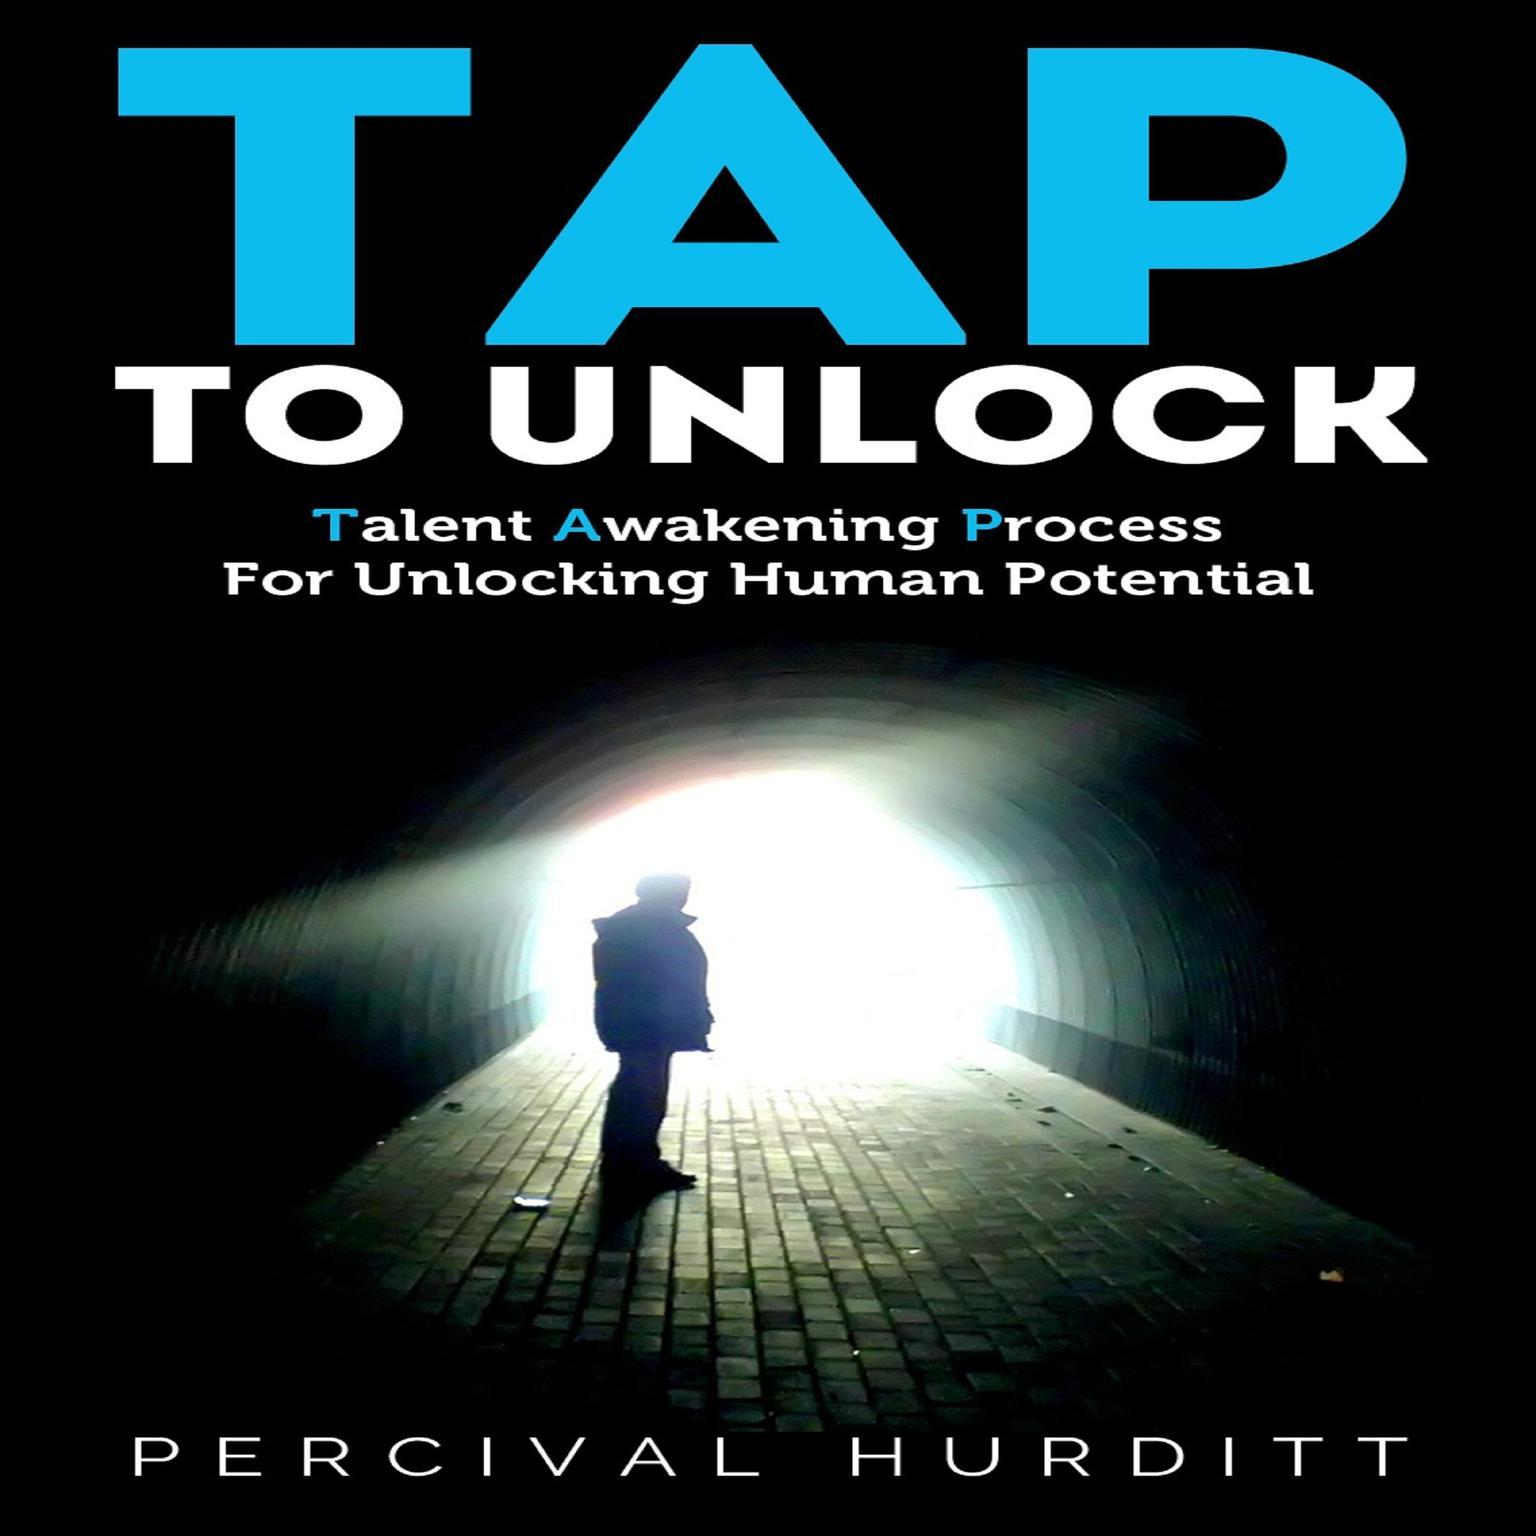 Tap to Unlock: Talent Awakening Process For Unlocking Human Potential Audiobook, by Percival Hurditt